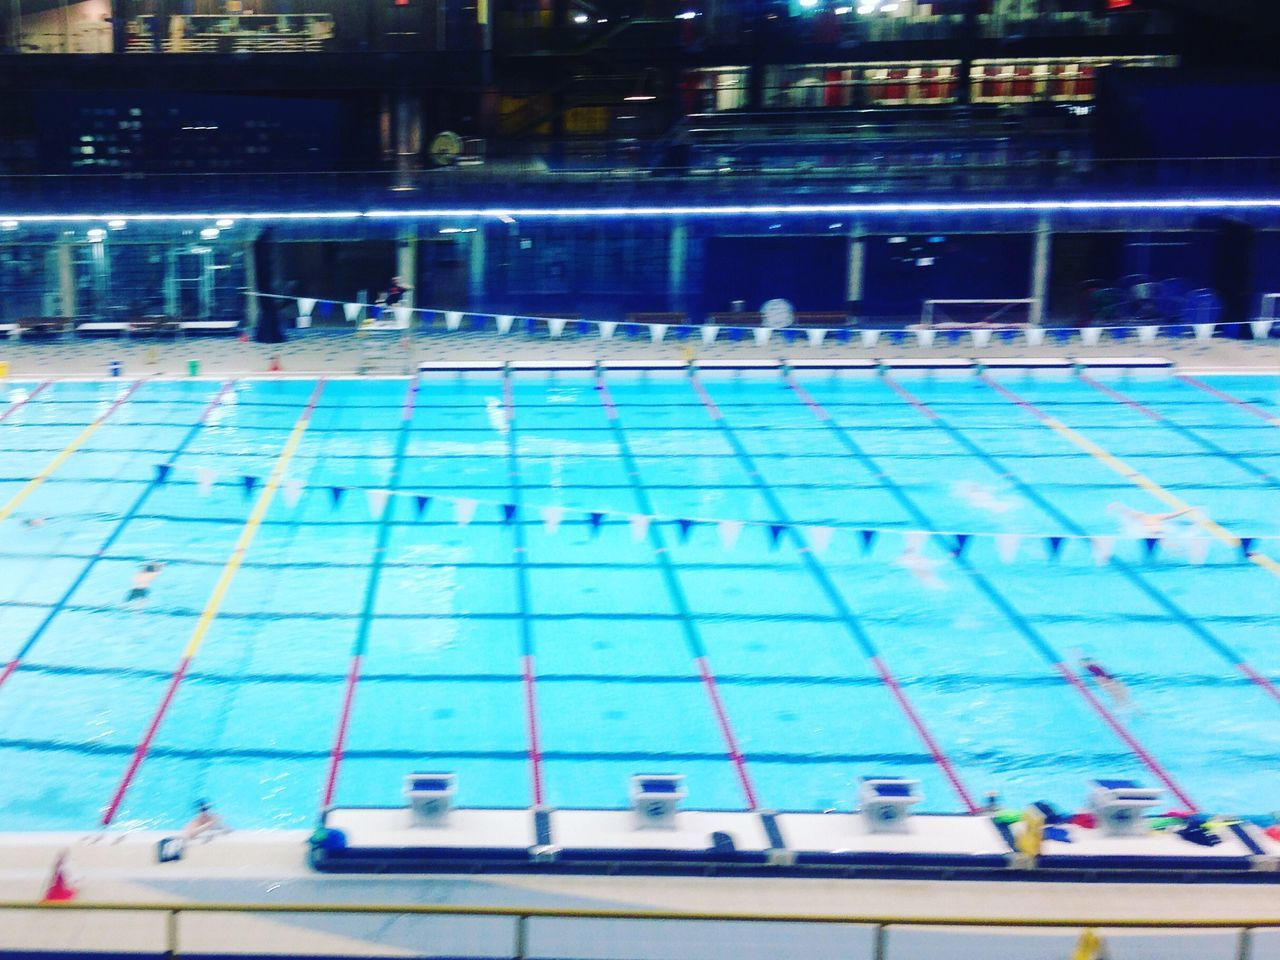 swimming pool, water, swimming lane marker, night, sport, indoors, illuminated, real people